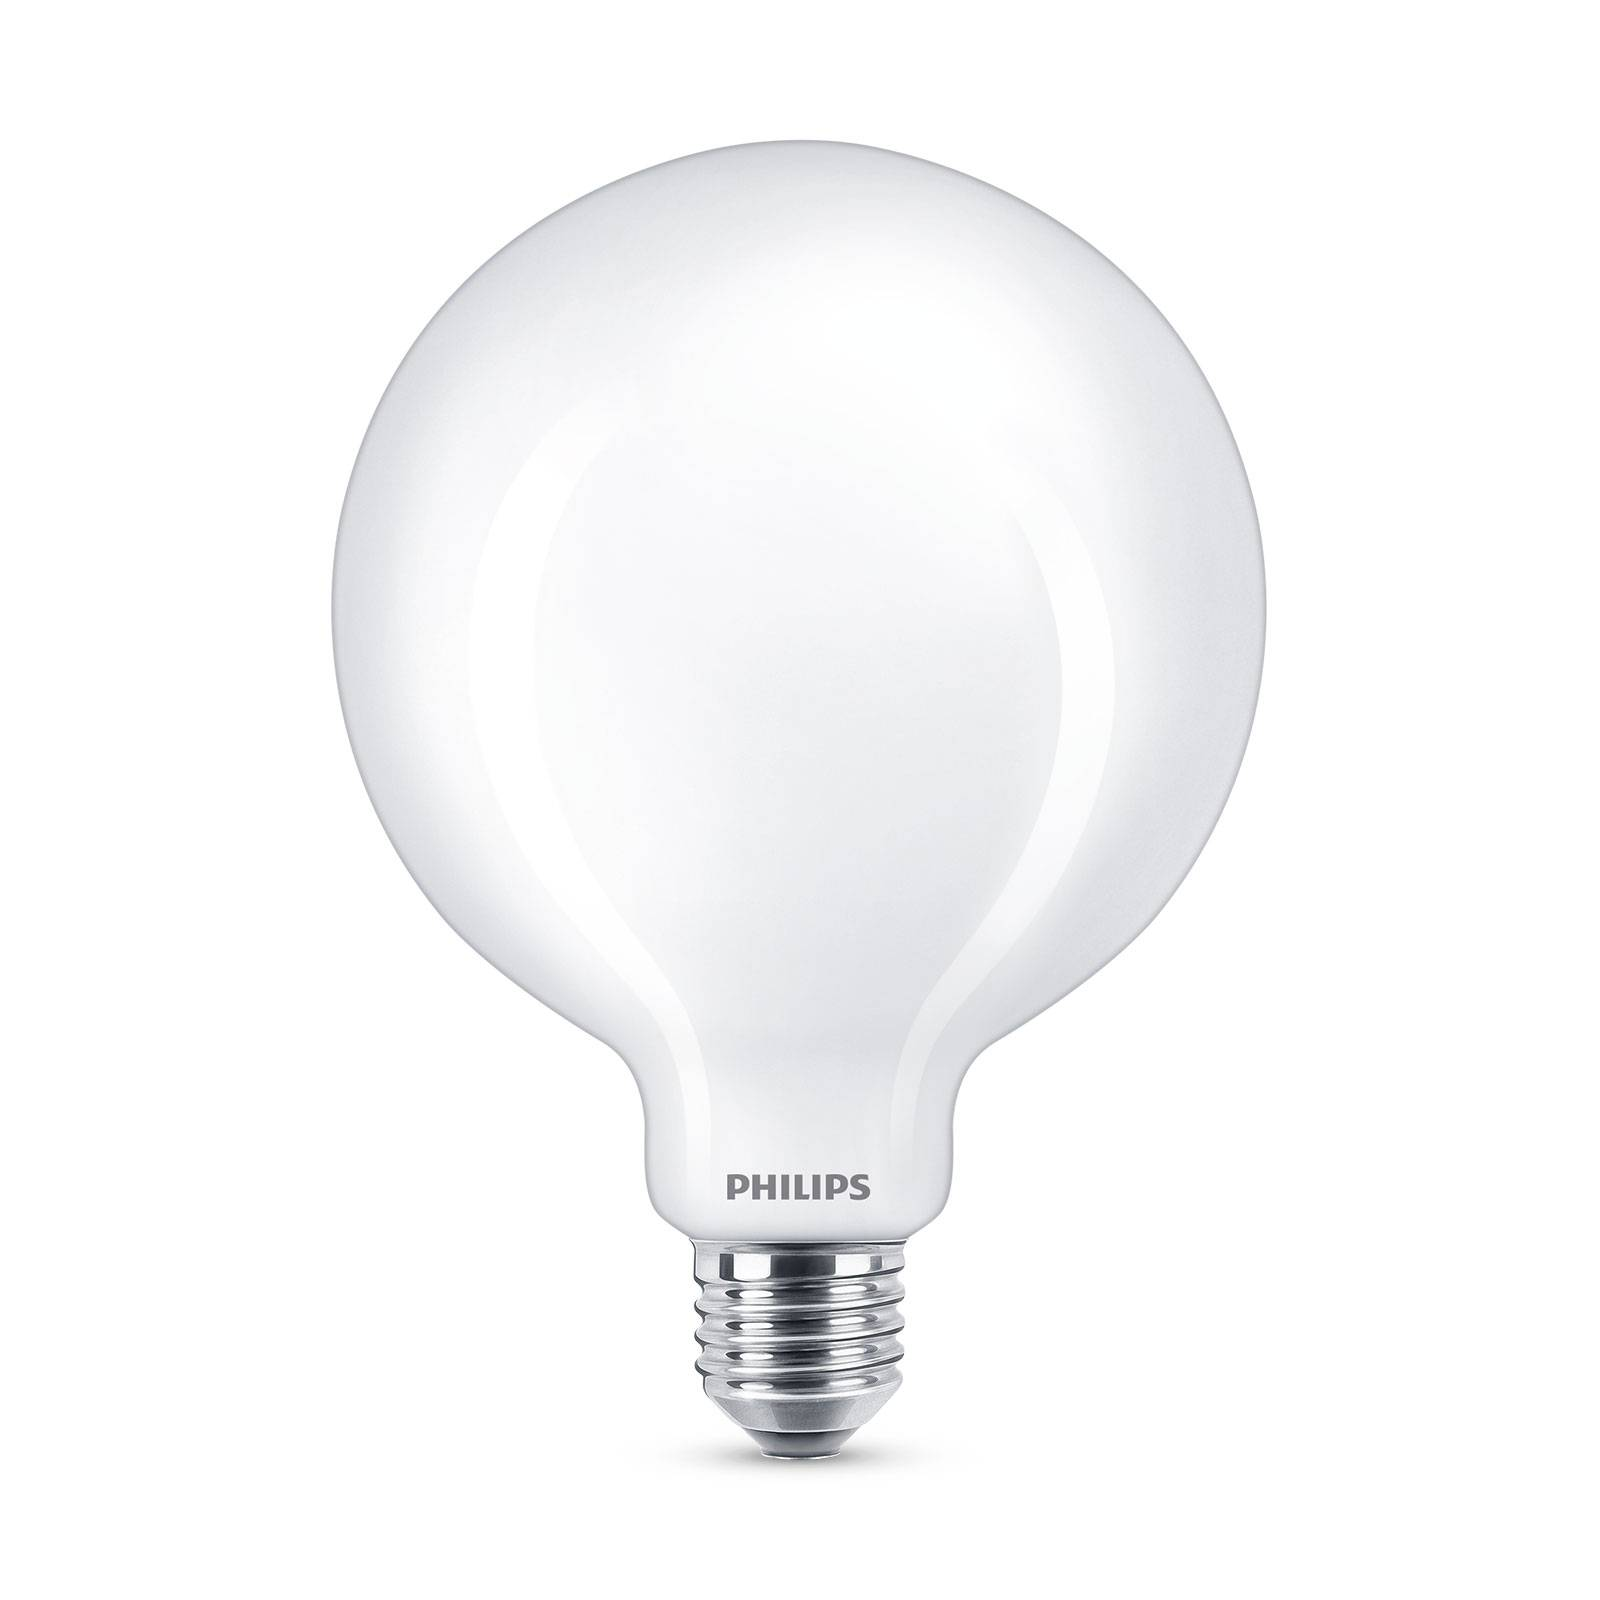 Philips Classic LED-lamppu E27 G120 7W 2 700 K